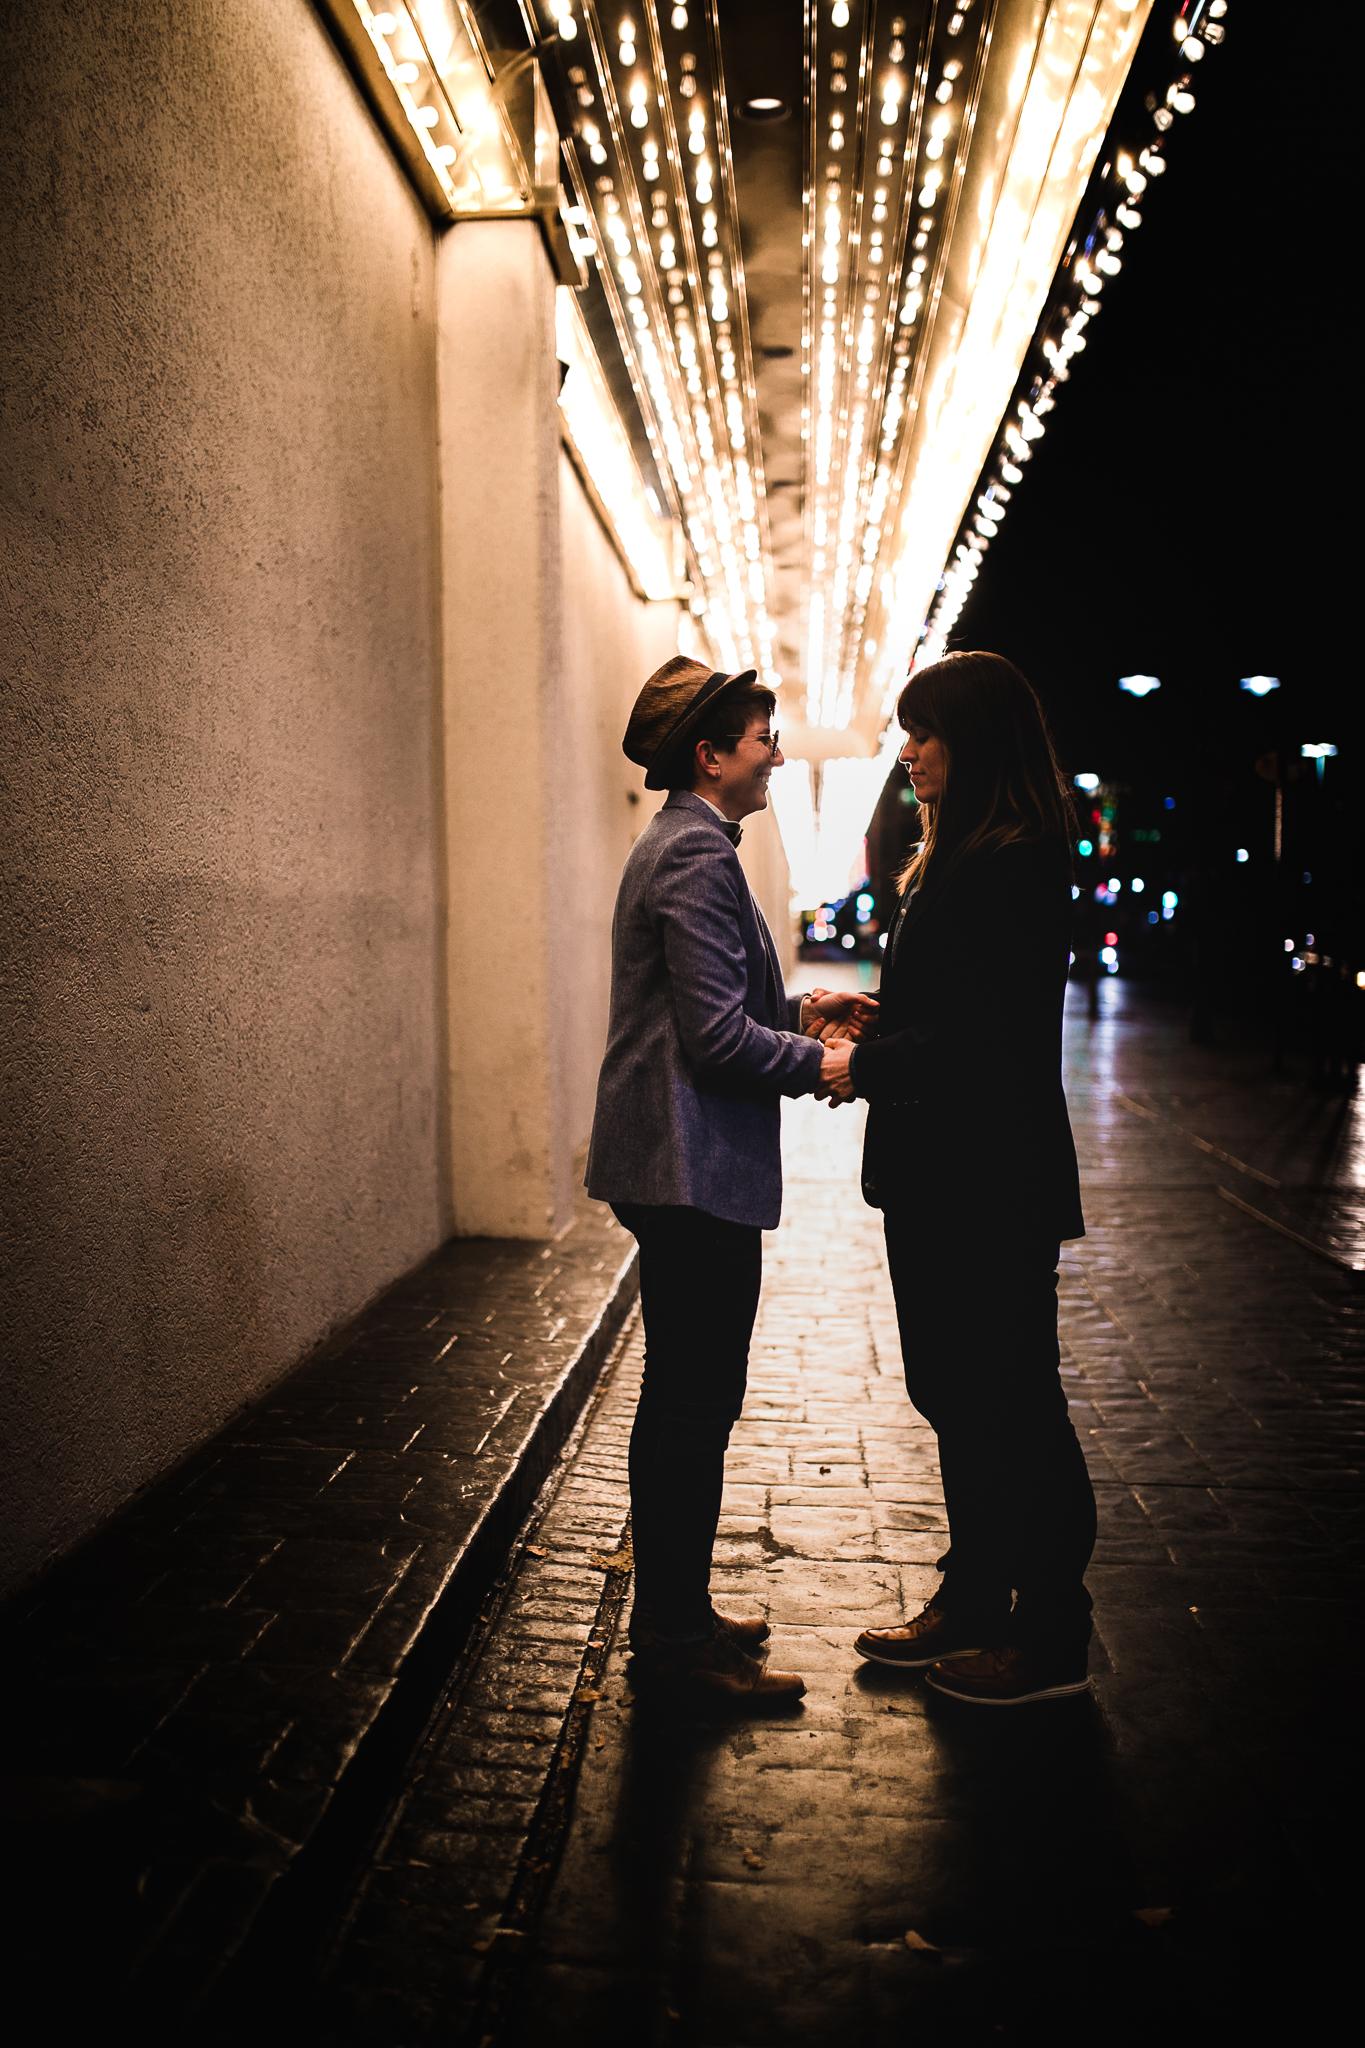 Archer Inspired Photography Hilary and Gia LGTBQ Reno Nevada Couple Wedding Engagement Photographer-12.jpg